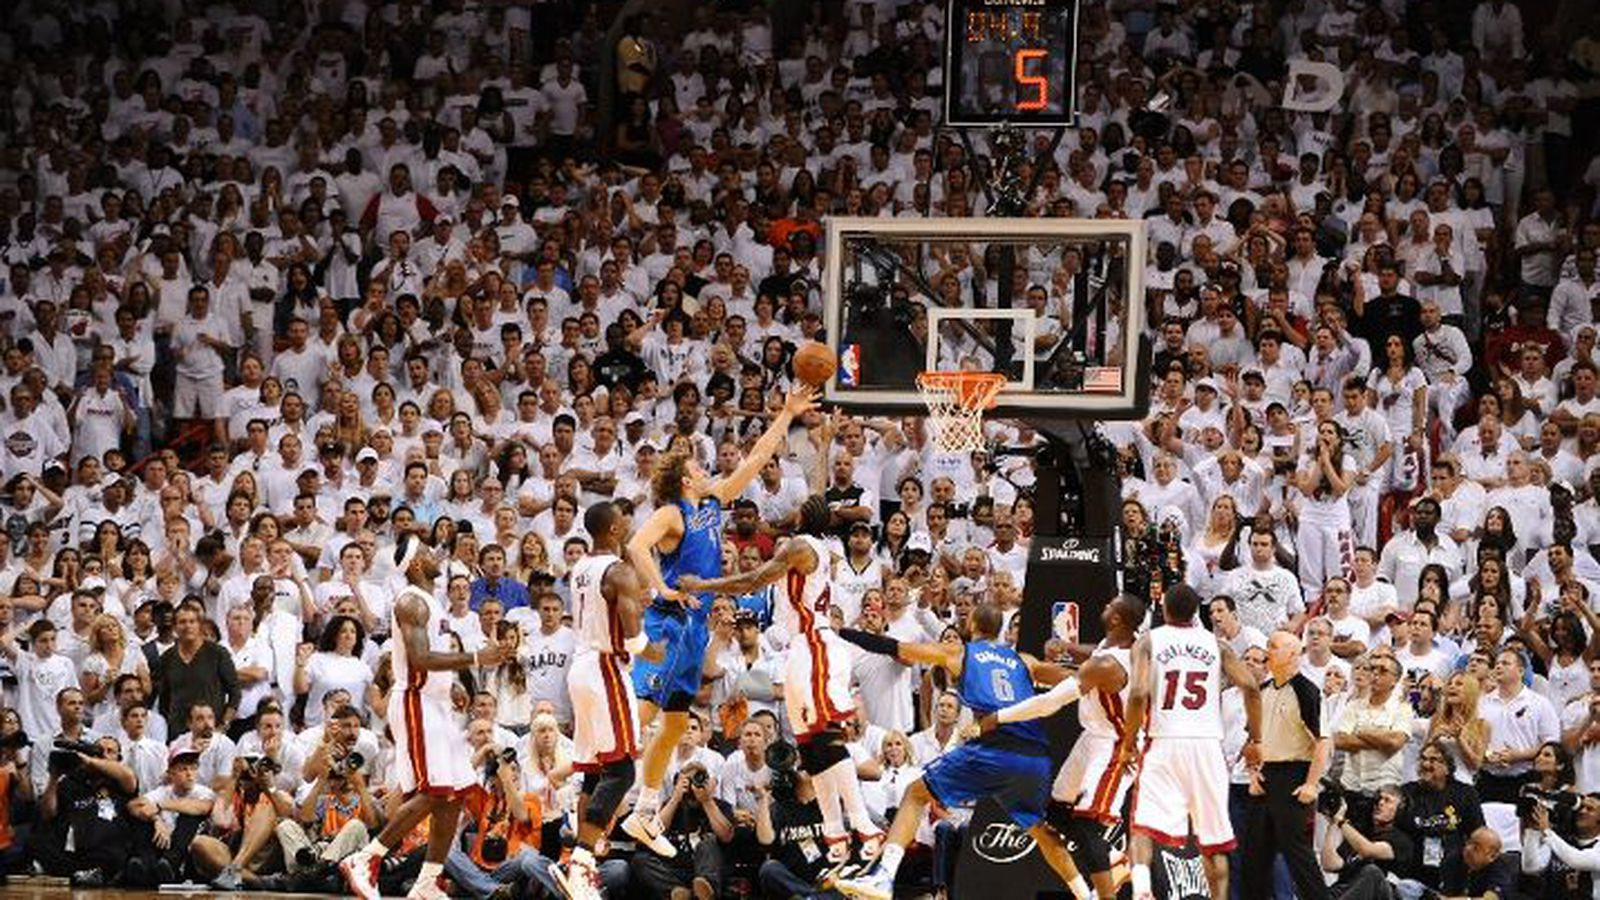 Nba Finals 2006 Game 6 Full Game | Basketball Scores